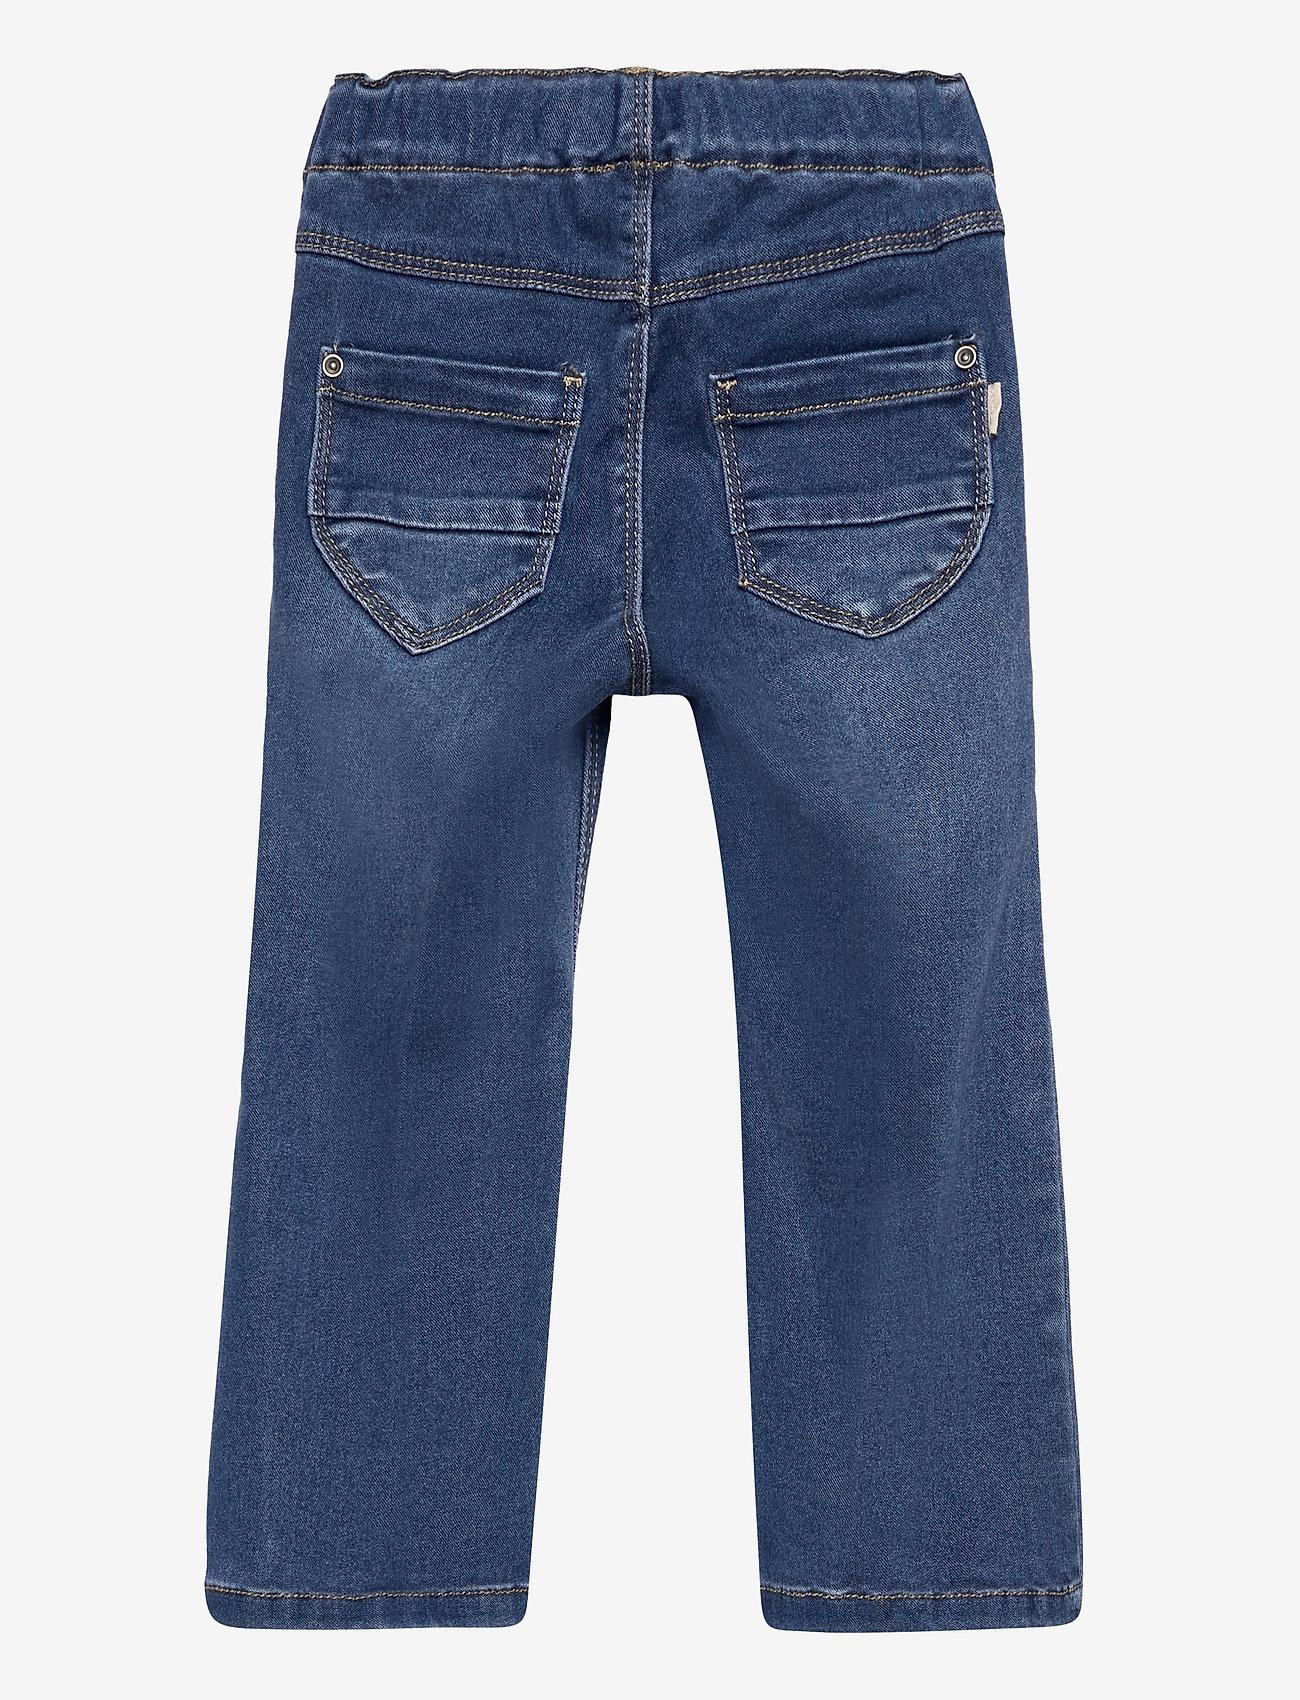 name it - NMFPOLLY DNMATORAS 2467 BOOT LEGGING - jeans - medium blue denim - 1